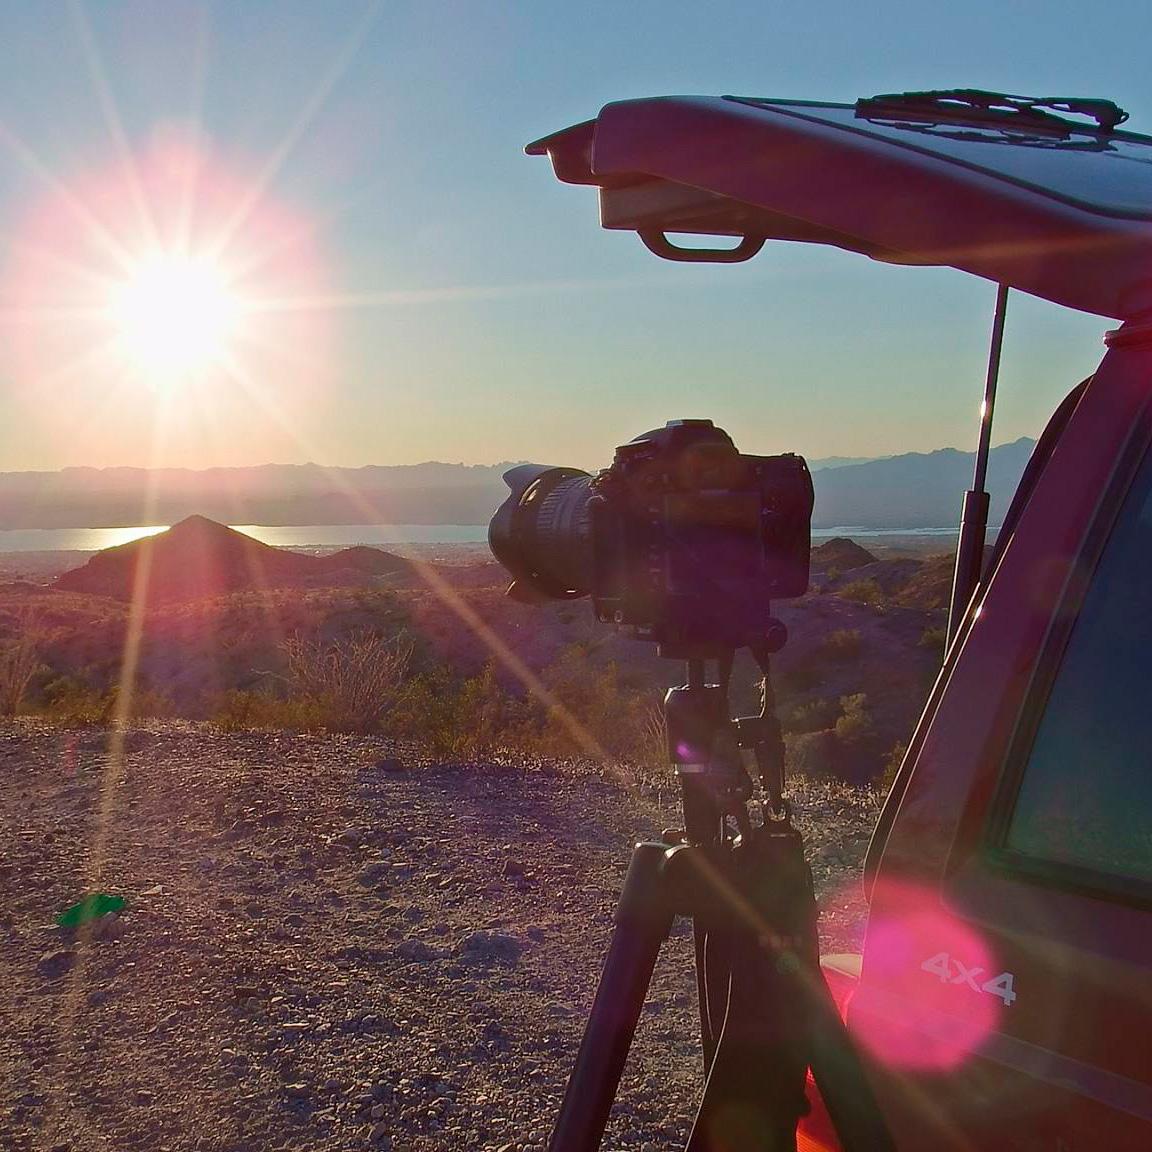 camera-and-jeep.jpg